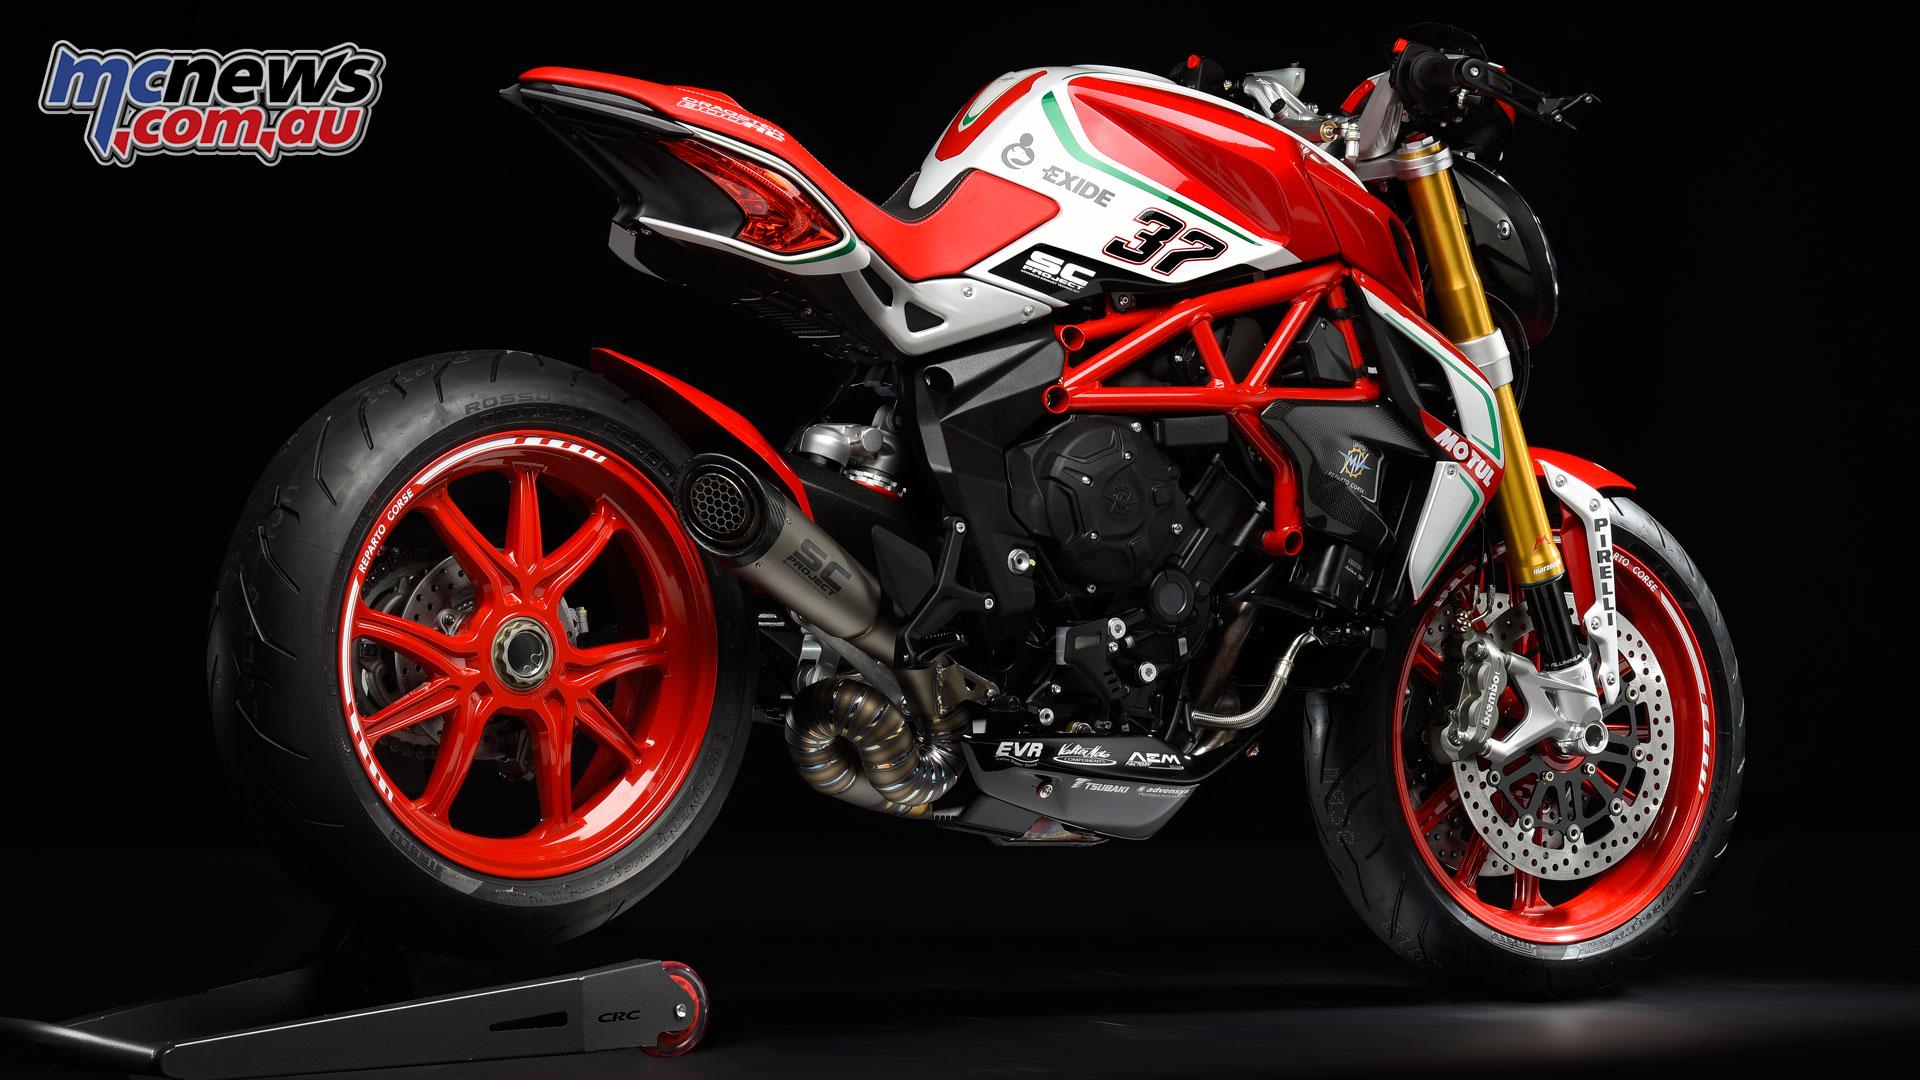 Italian motorcycle designer, MV Agusta, reveals 2018